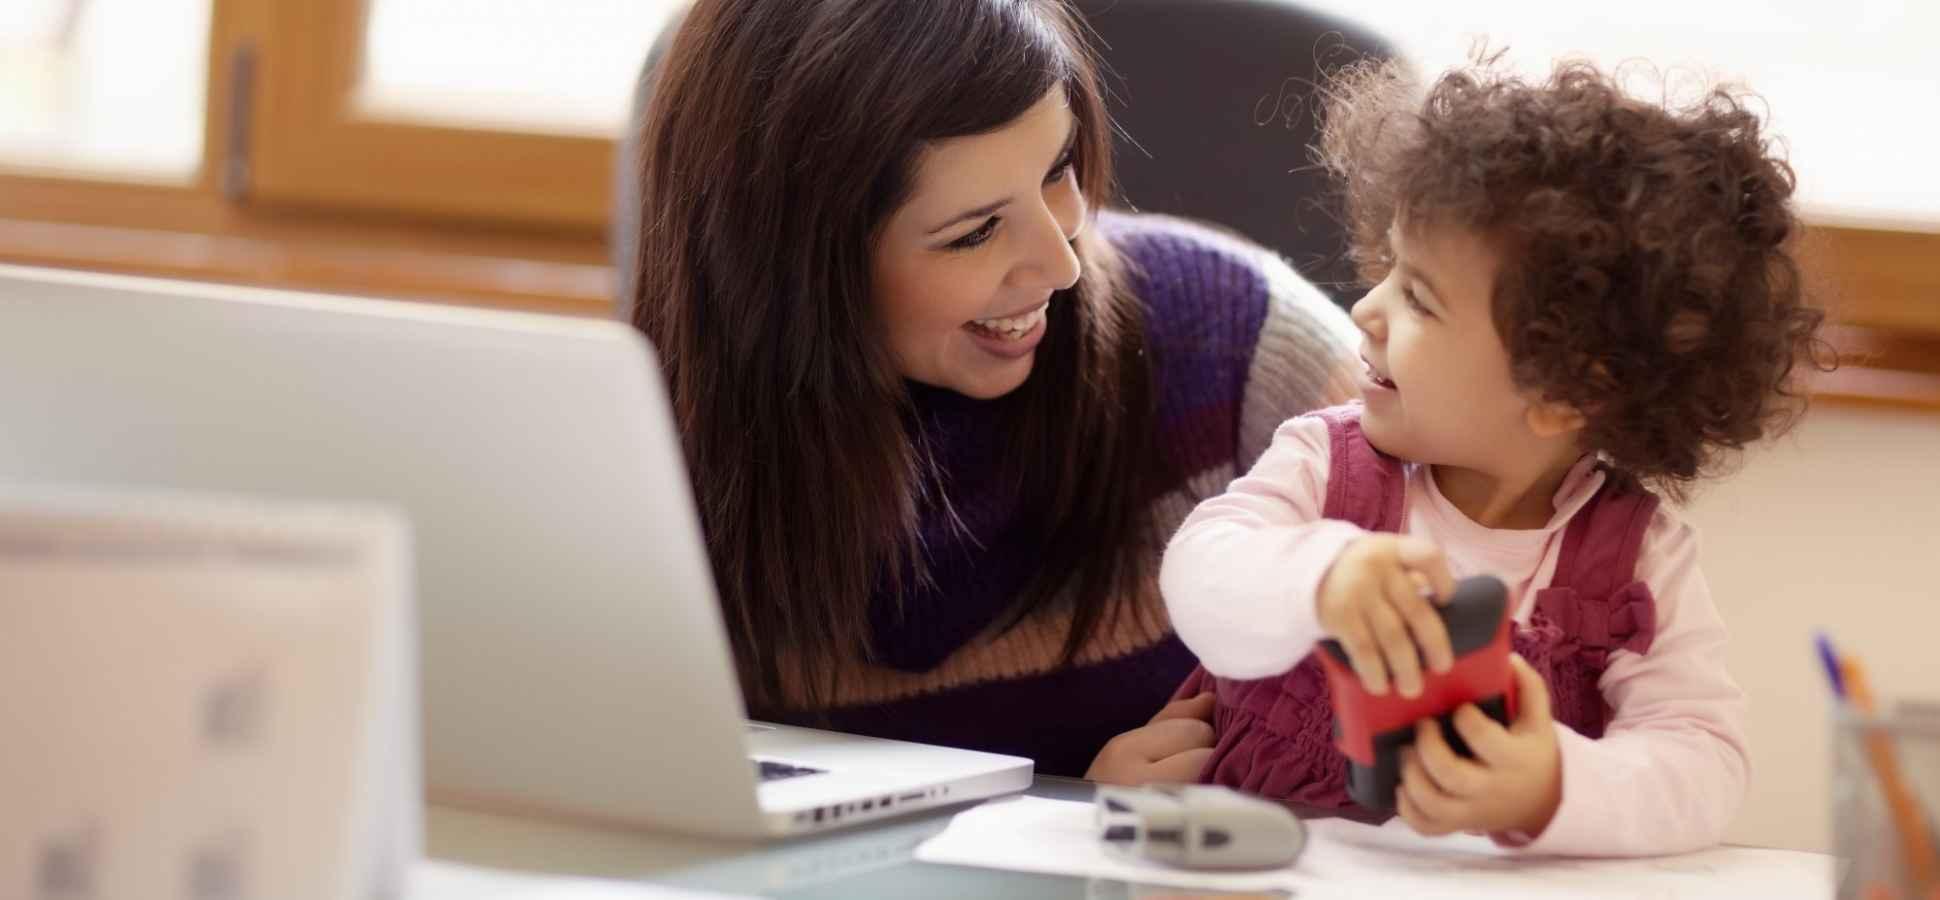 3 Ways Working Moms Impact their Kids, According to Harvard Researchers